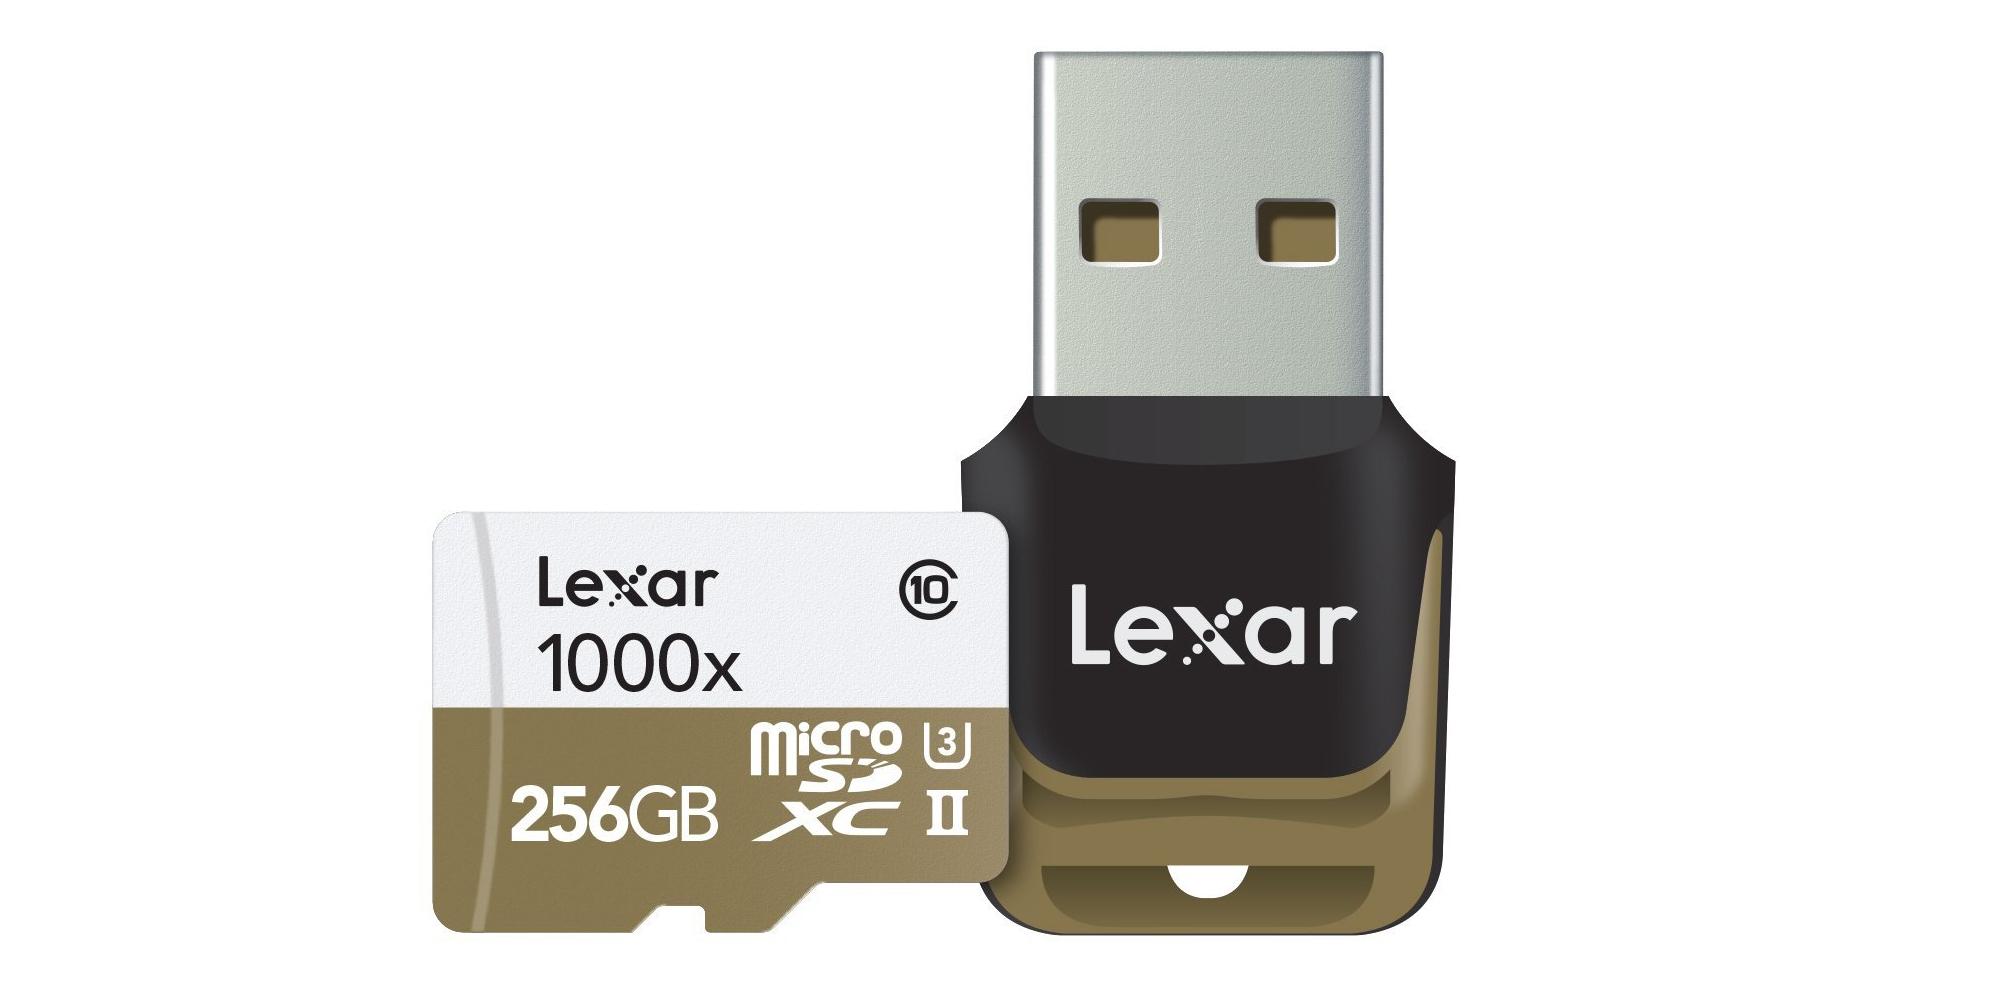 Lexar's Professional microSDXC 256GB Card sports 150MBps transfer speeds at $180 (30% off)